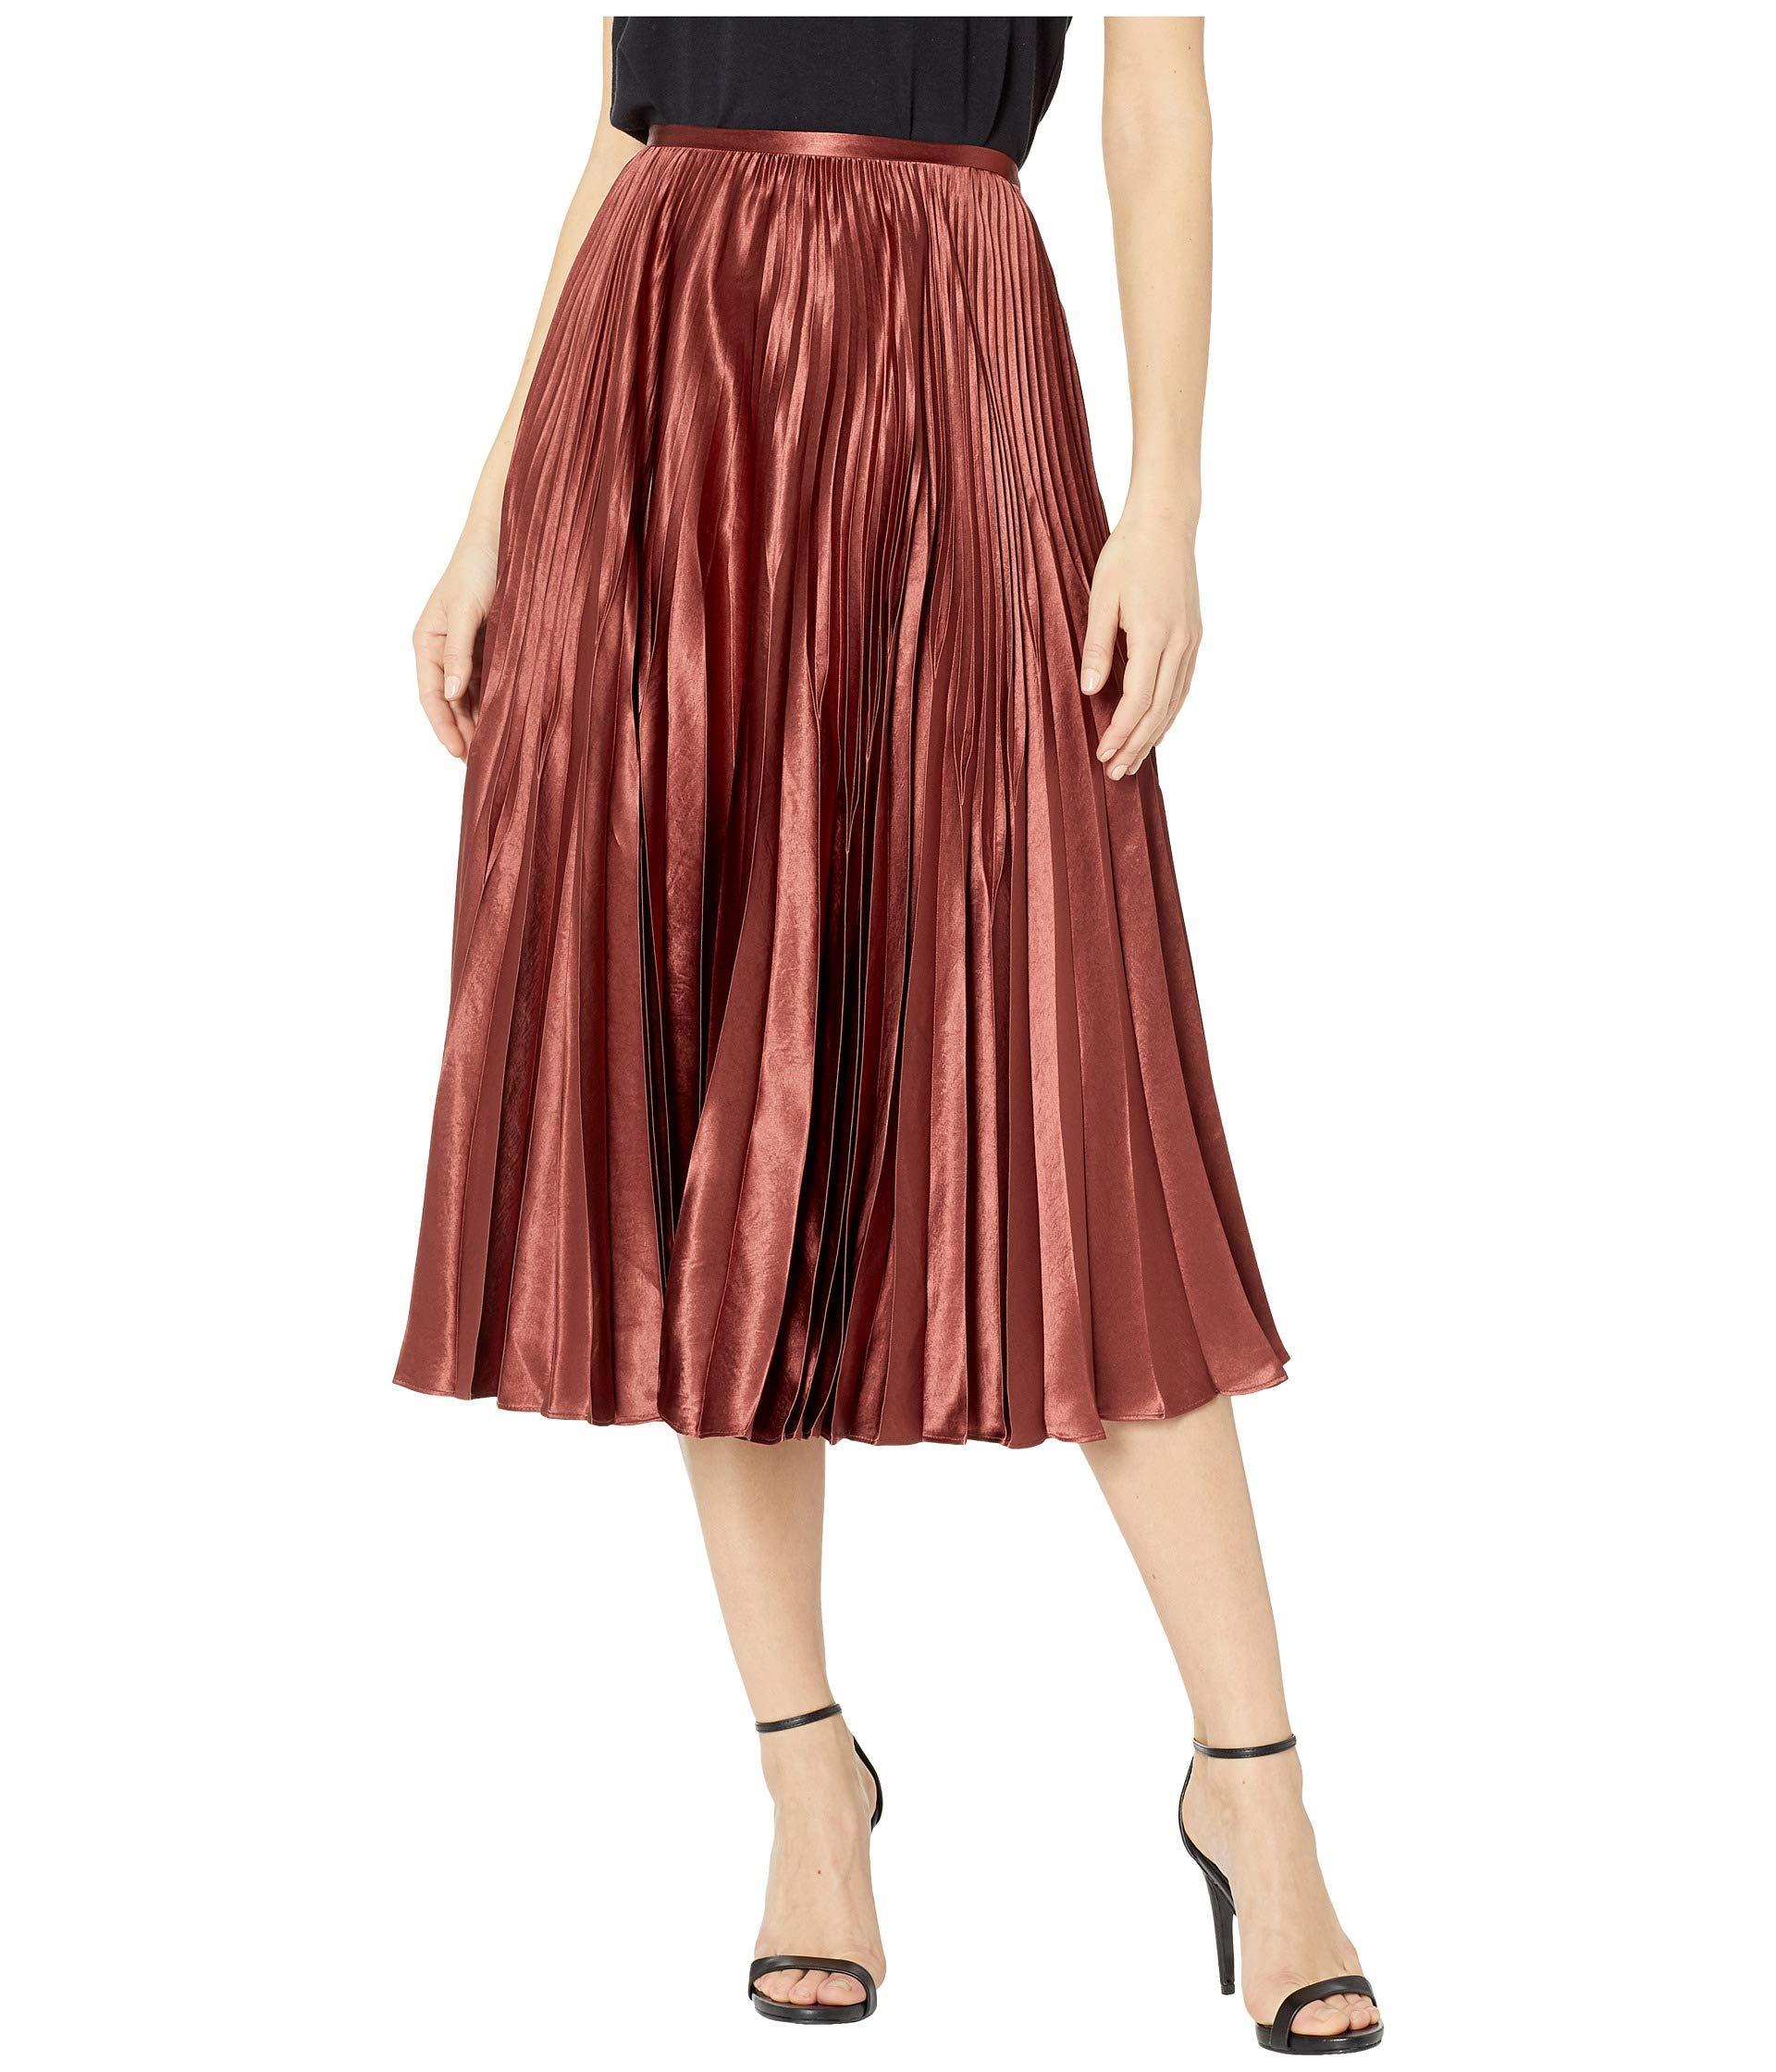 348868cf35 Vince - Red Pleated Satin Midi Skirt Brick - Lyst. View fullscreen